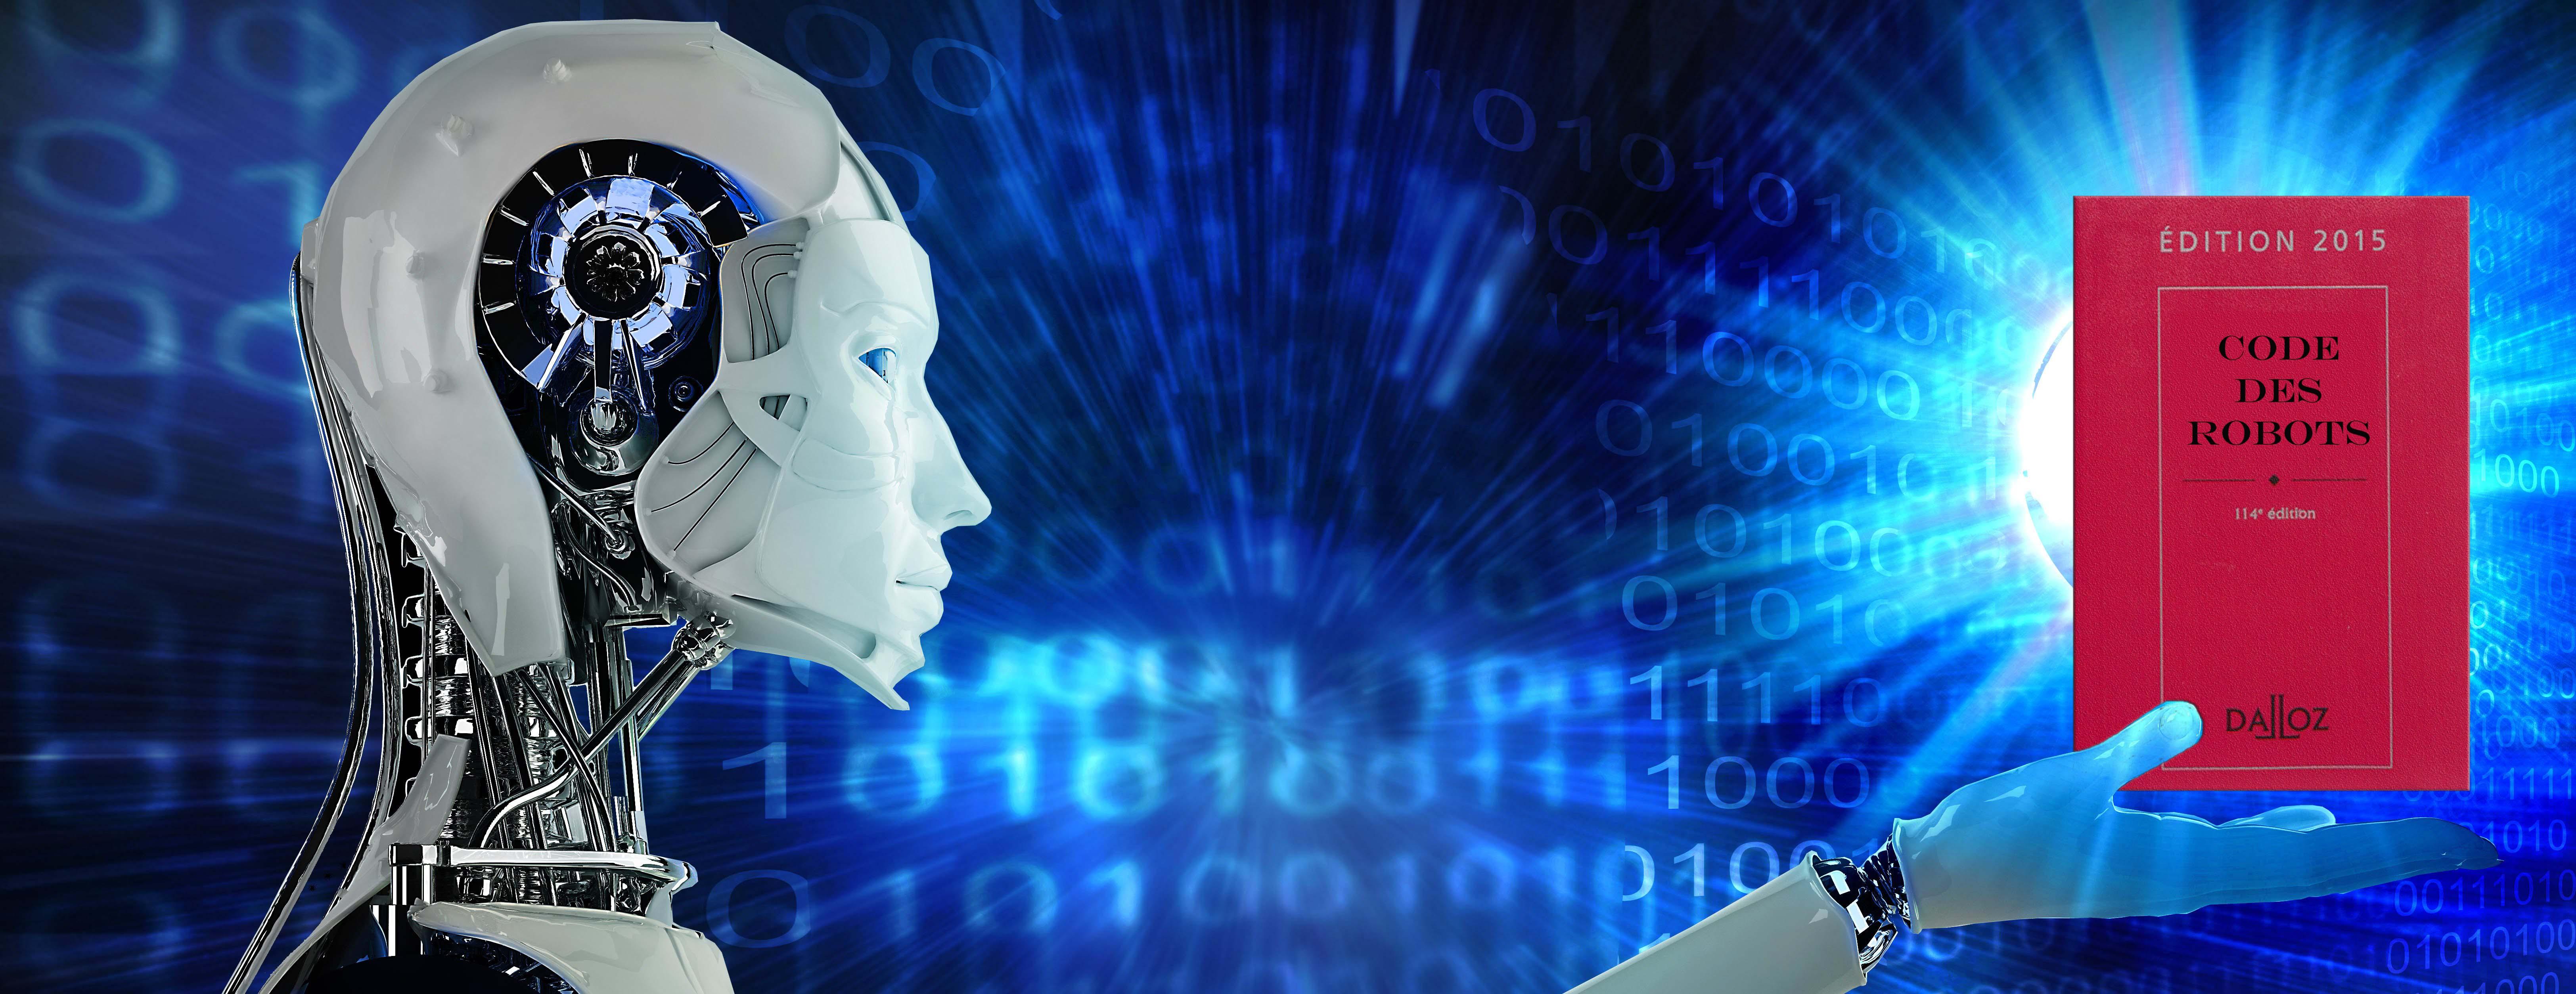 Code des robots